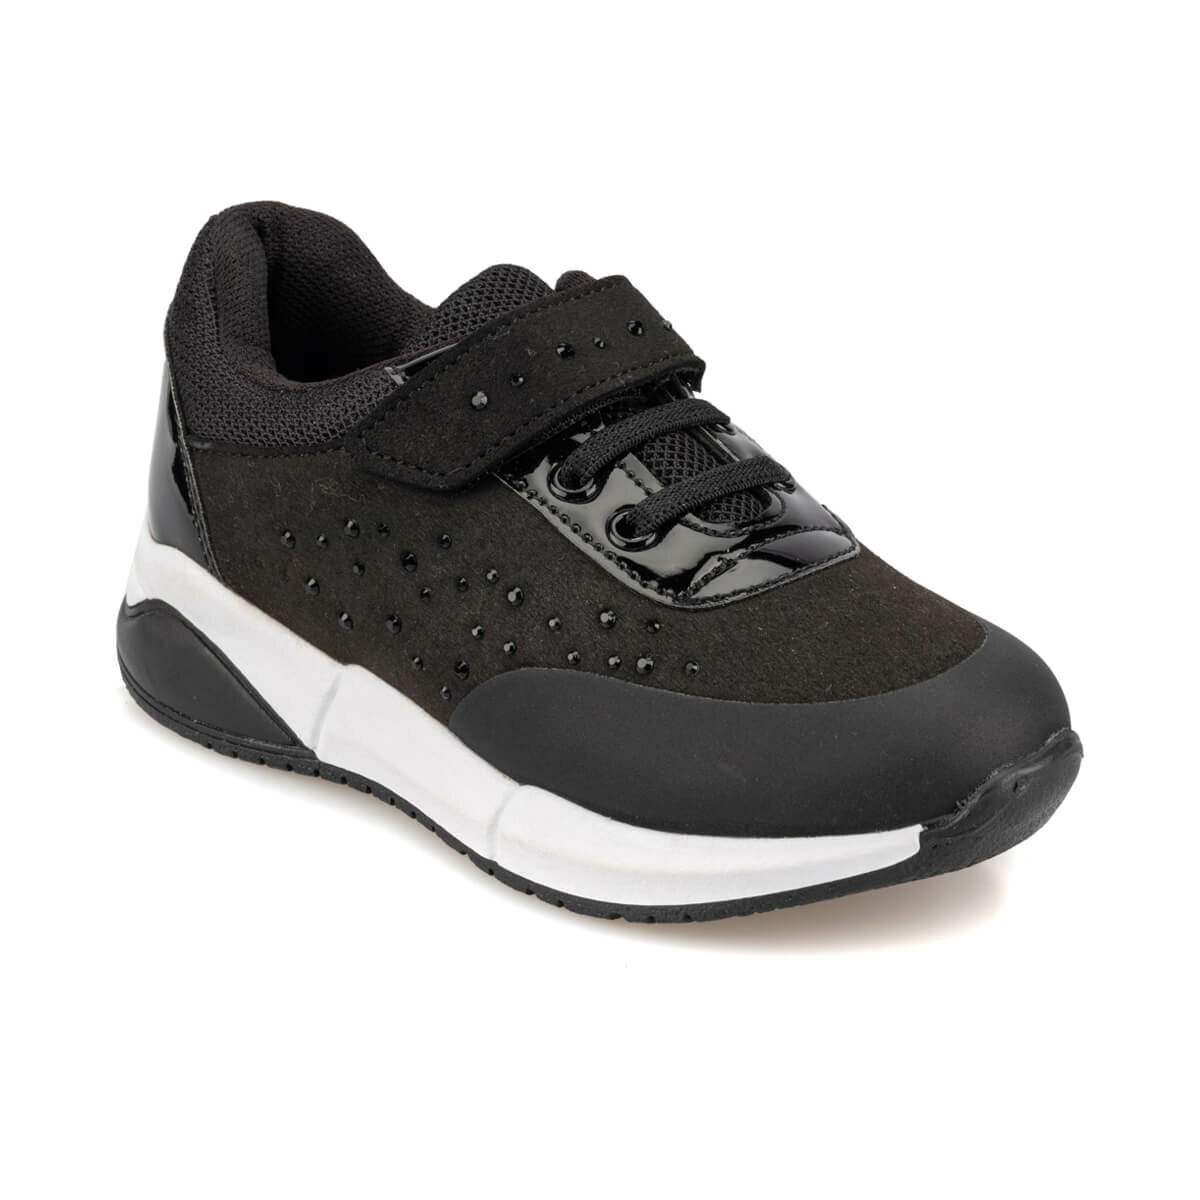 FLO 92.509591.P Black Female Child Sports Shoes Polaris